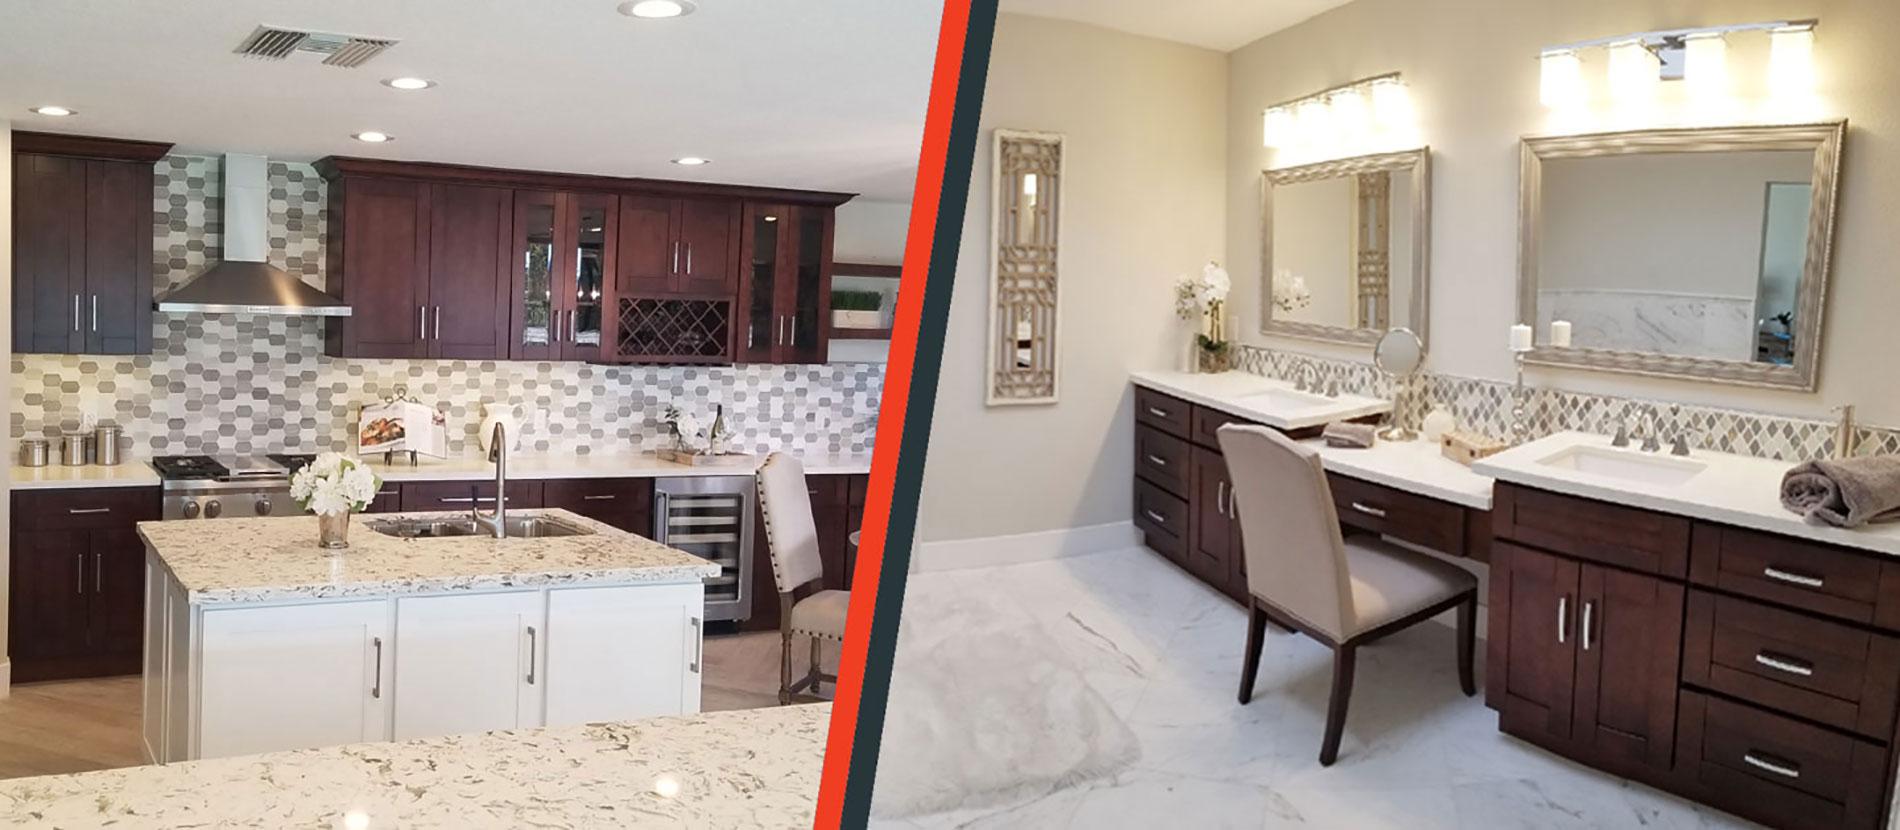 CUSTOM-QUALITY KITCHEN ... & Kitchen u0026 Bath - Legacy Kitchen u0026 Bath Palm Desert CA